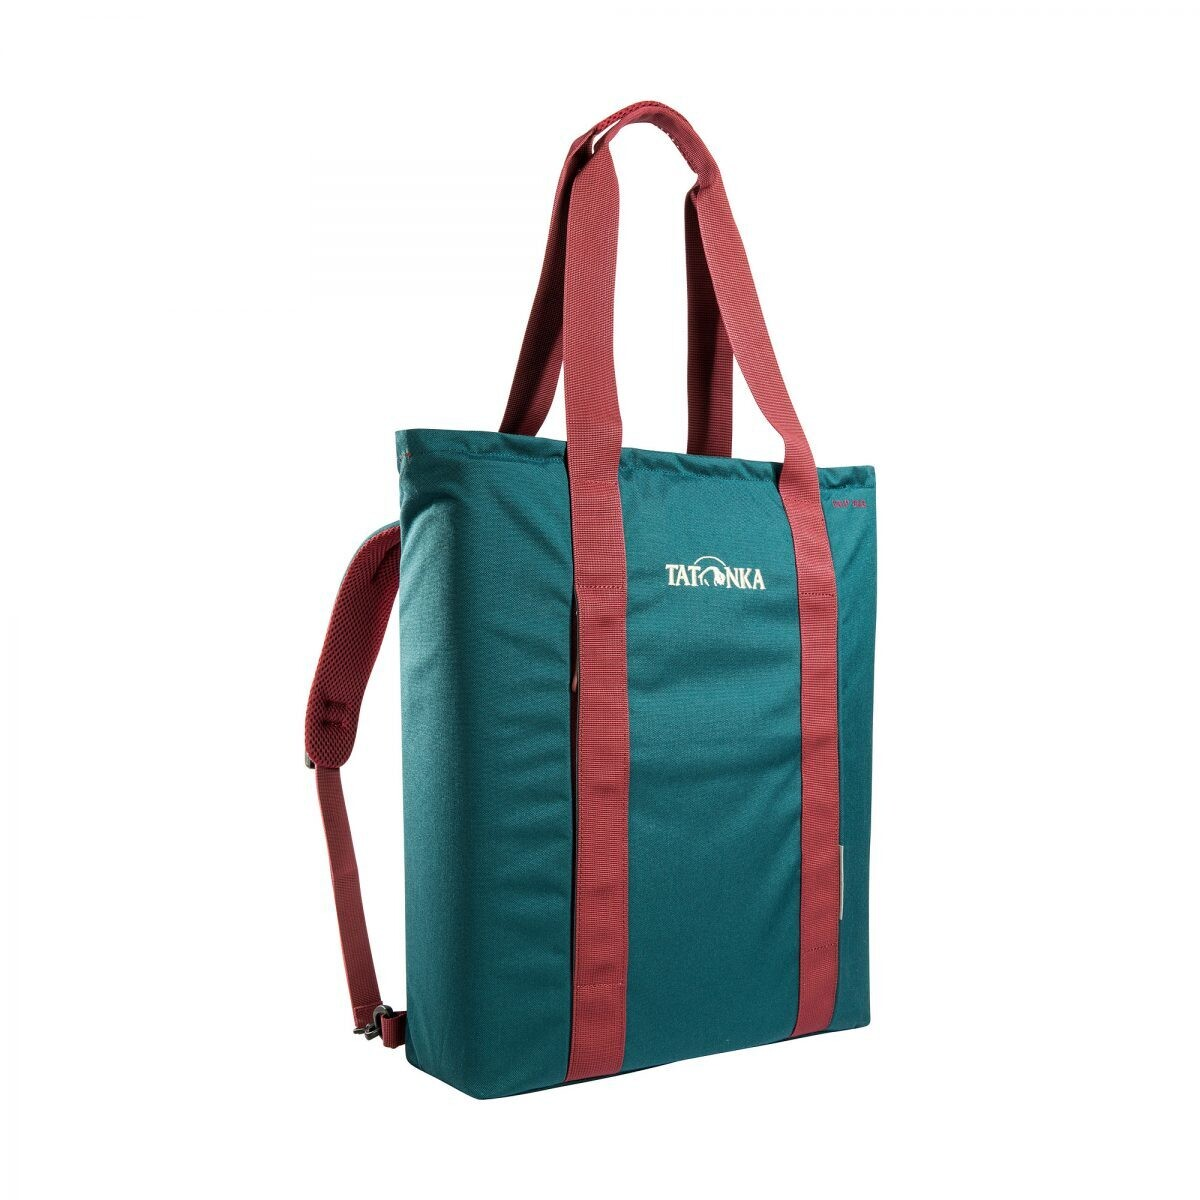 TATONKA Grip Bag